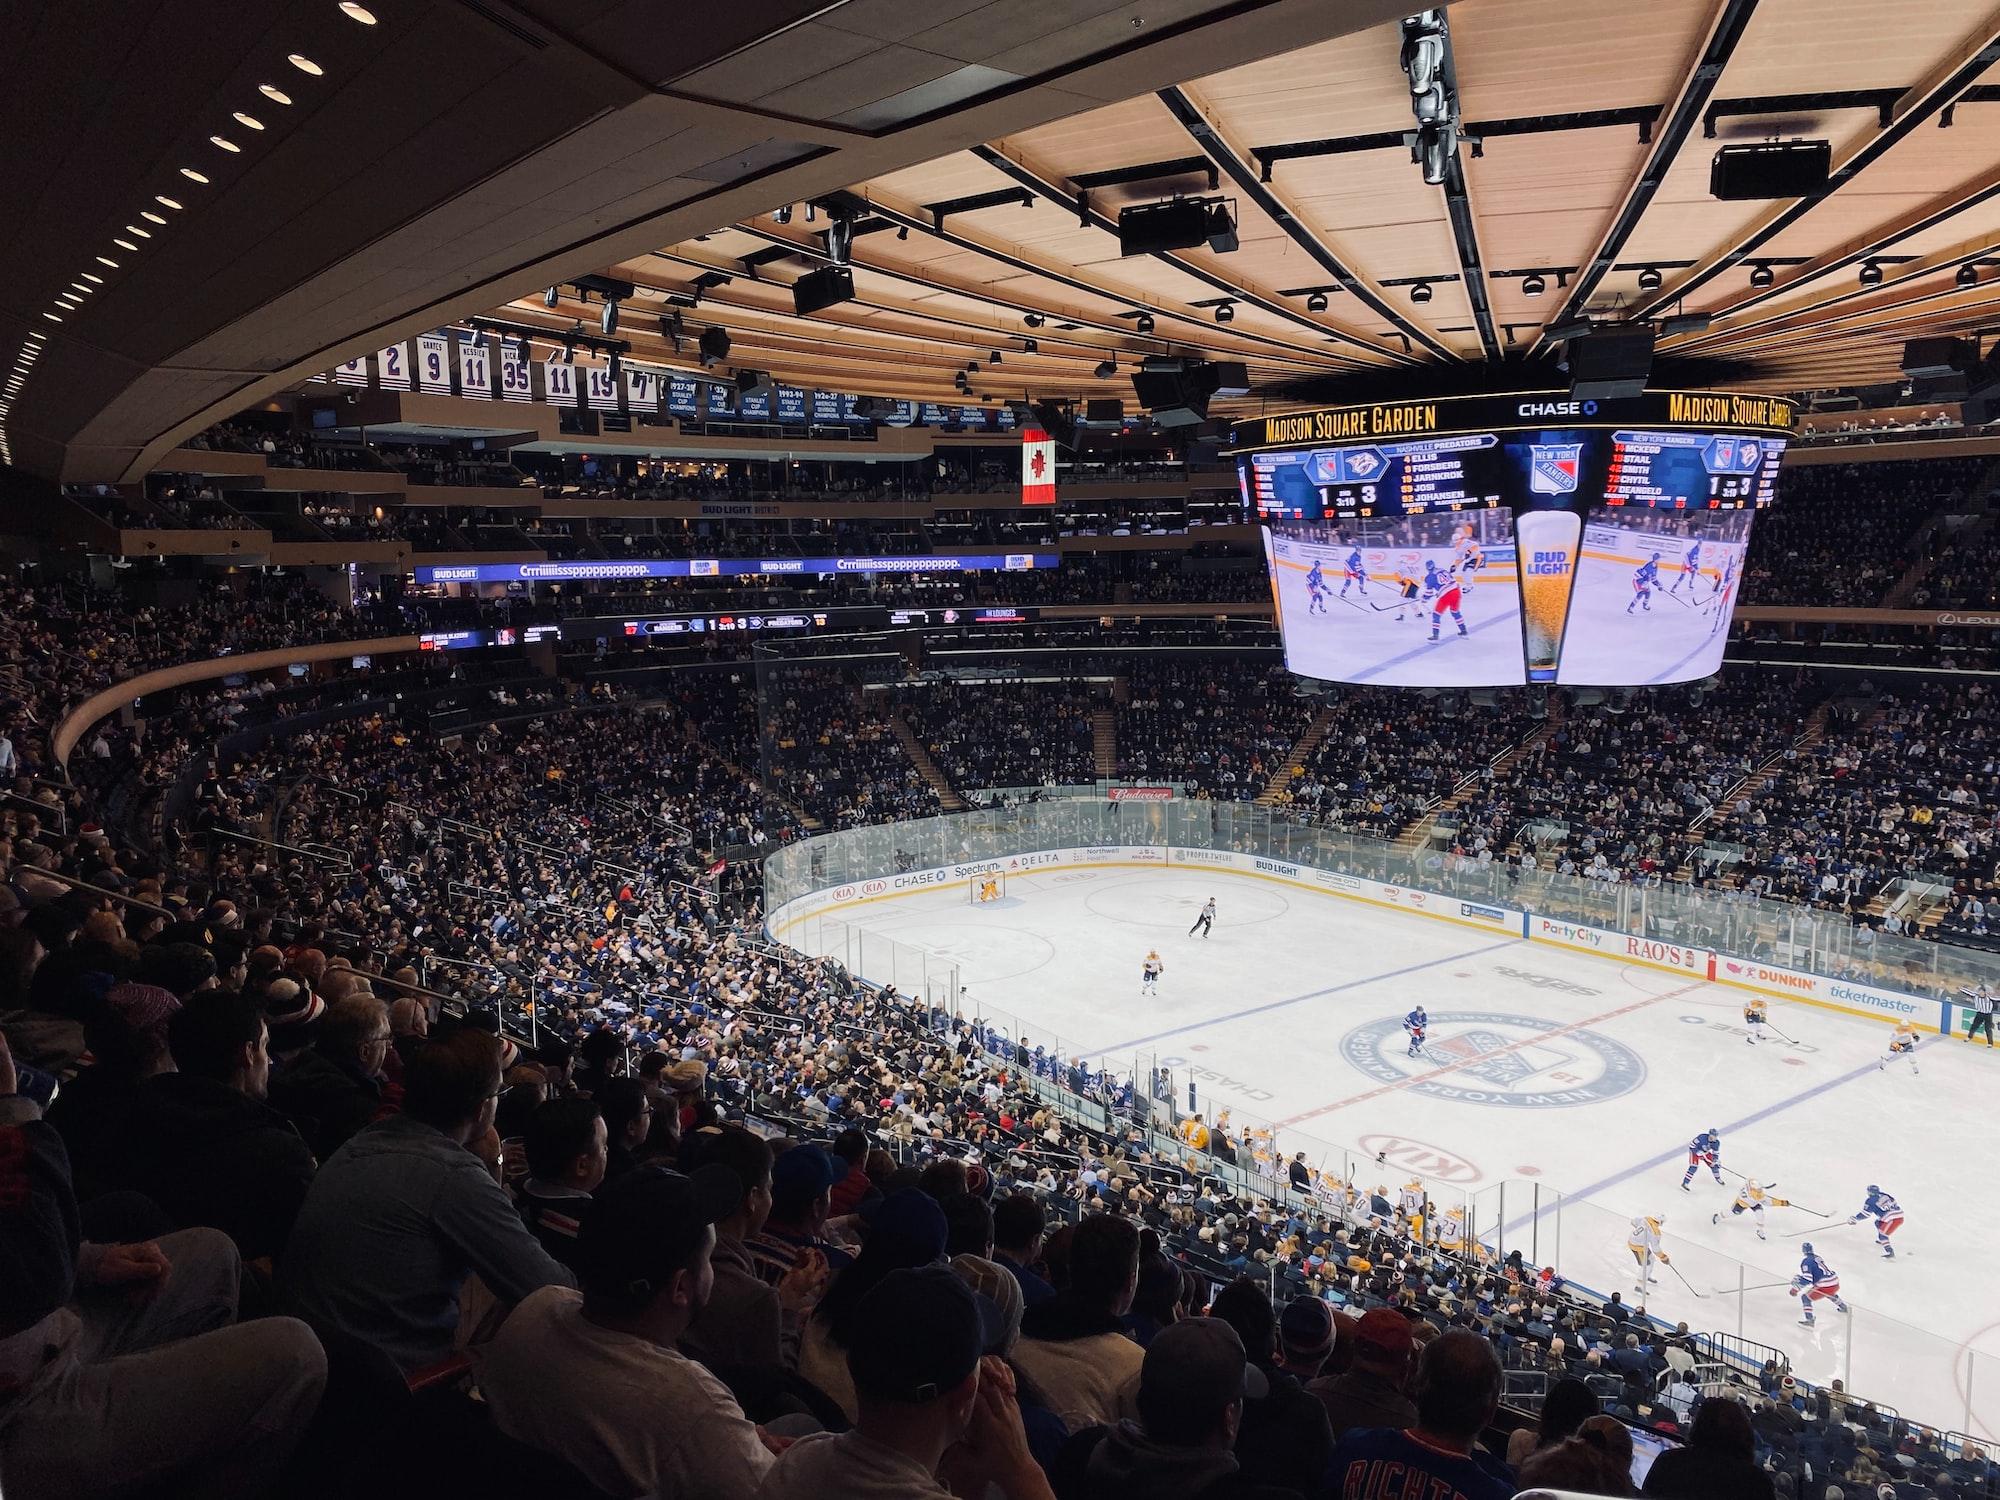 Rangers vs Predators at Madison square garden msg